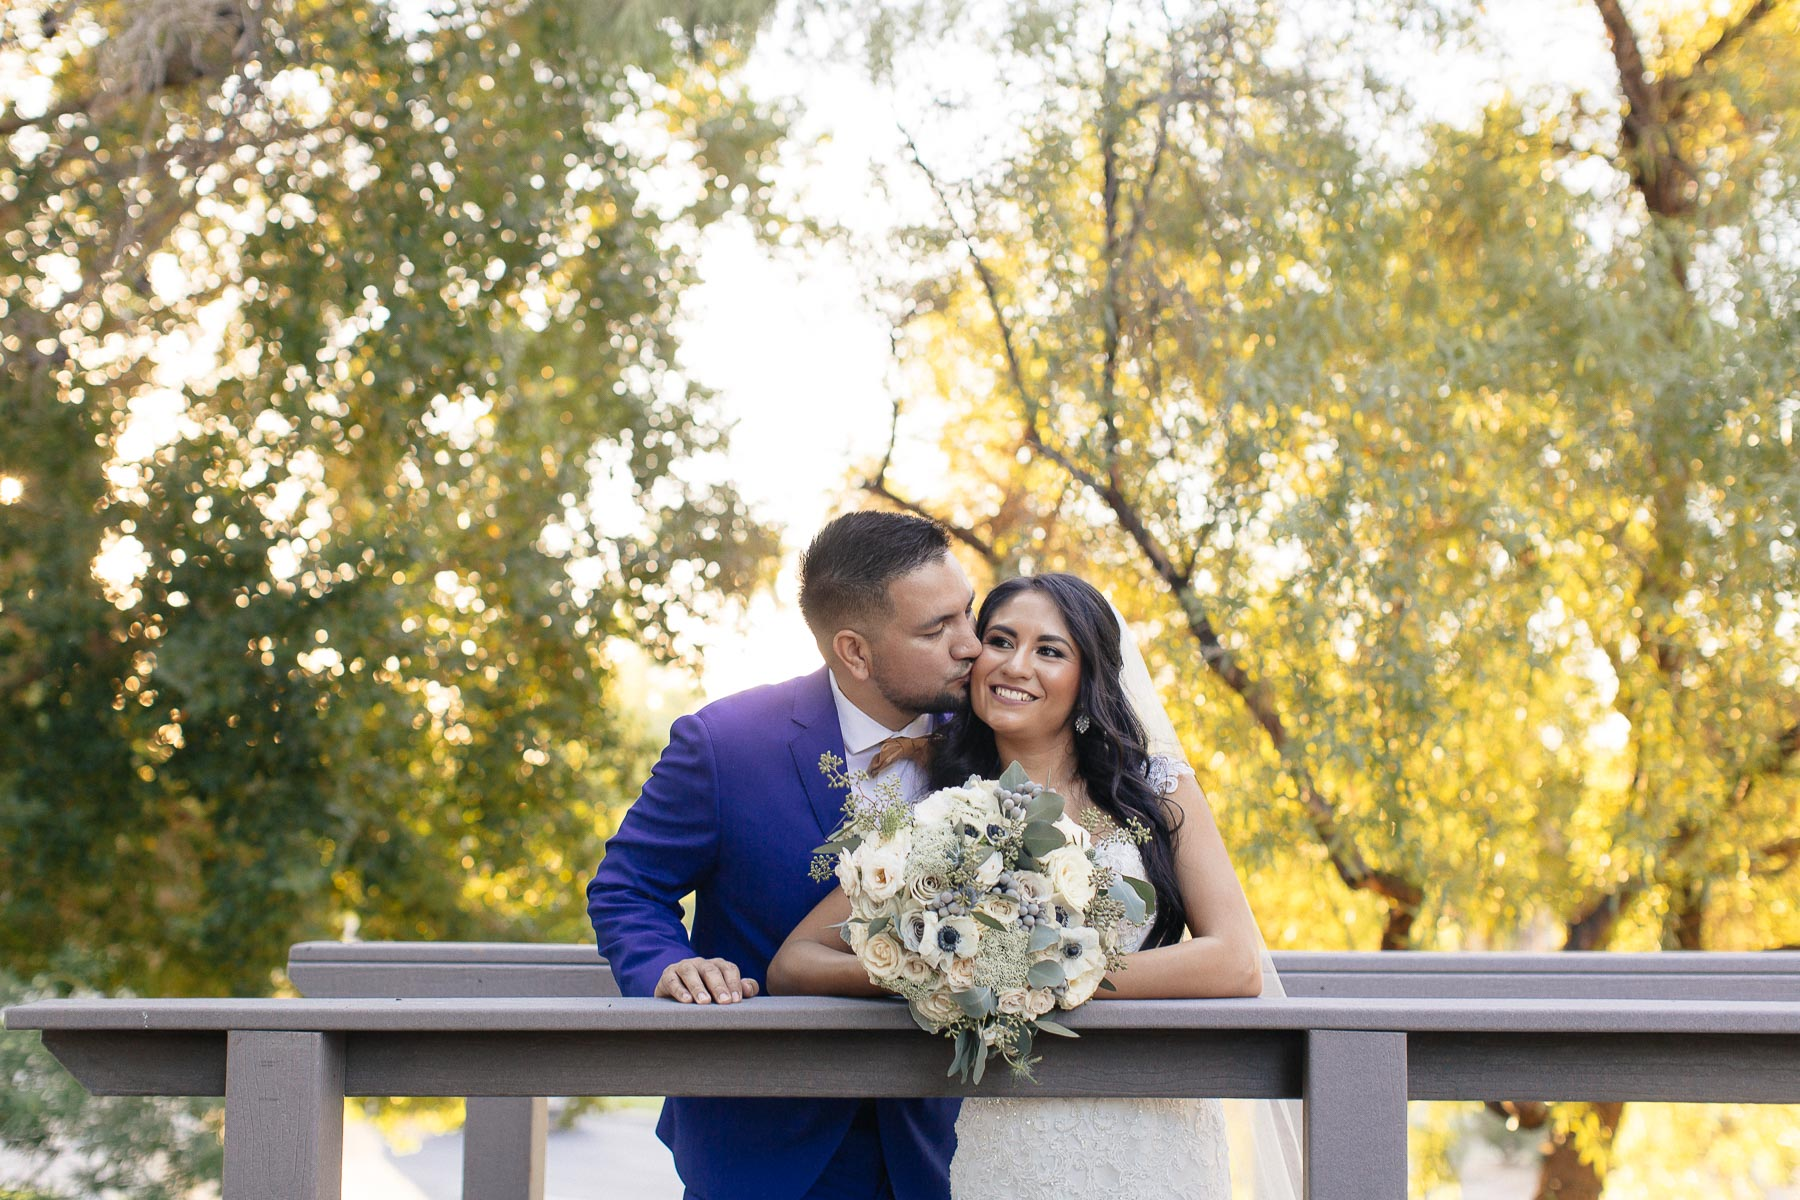 161029-Luxium-Weddings-Arizona-Jeff-Griselda-First-Look-Val-Vista-Lakes-Gilber-057.jpg